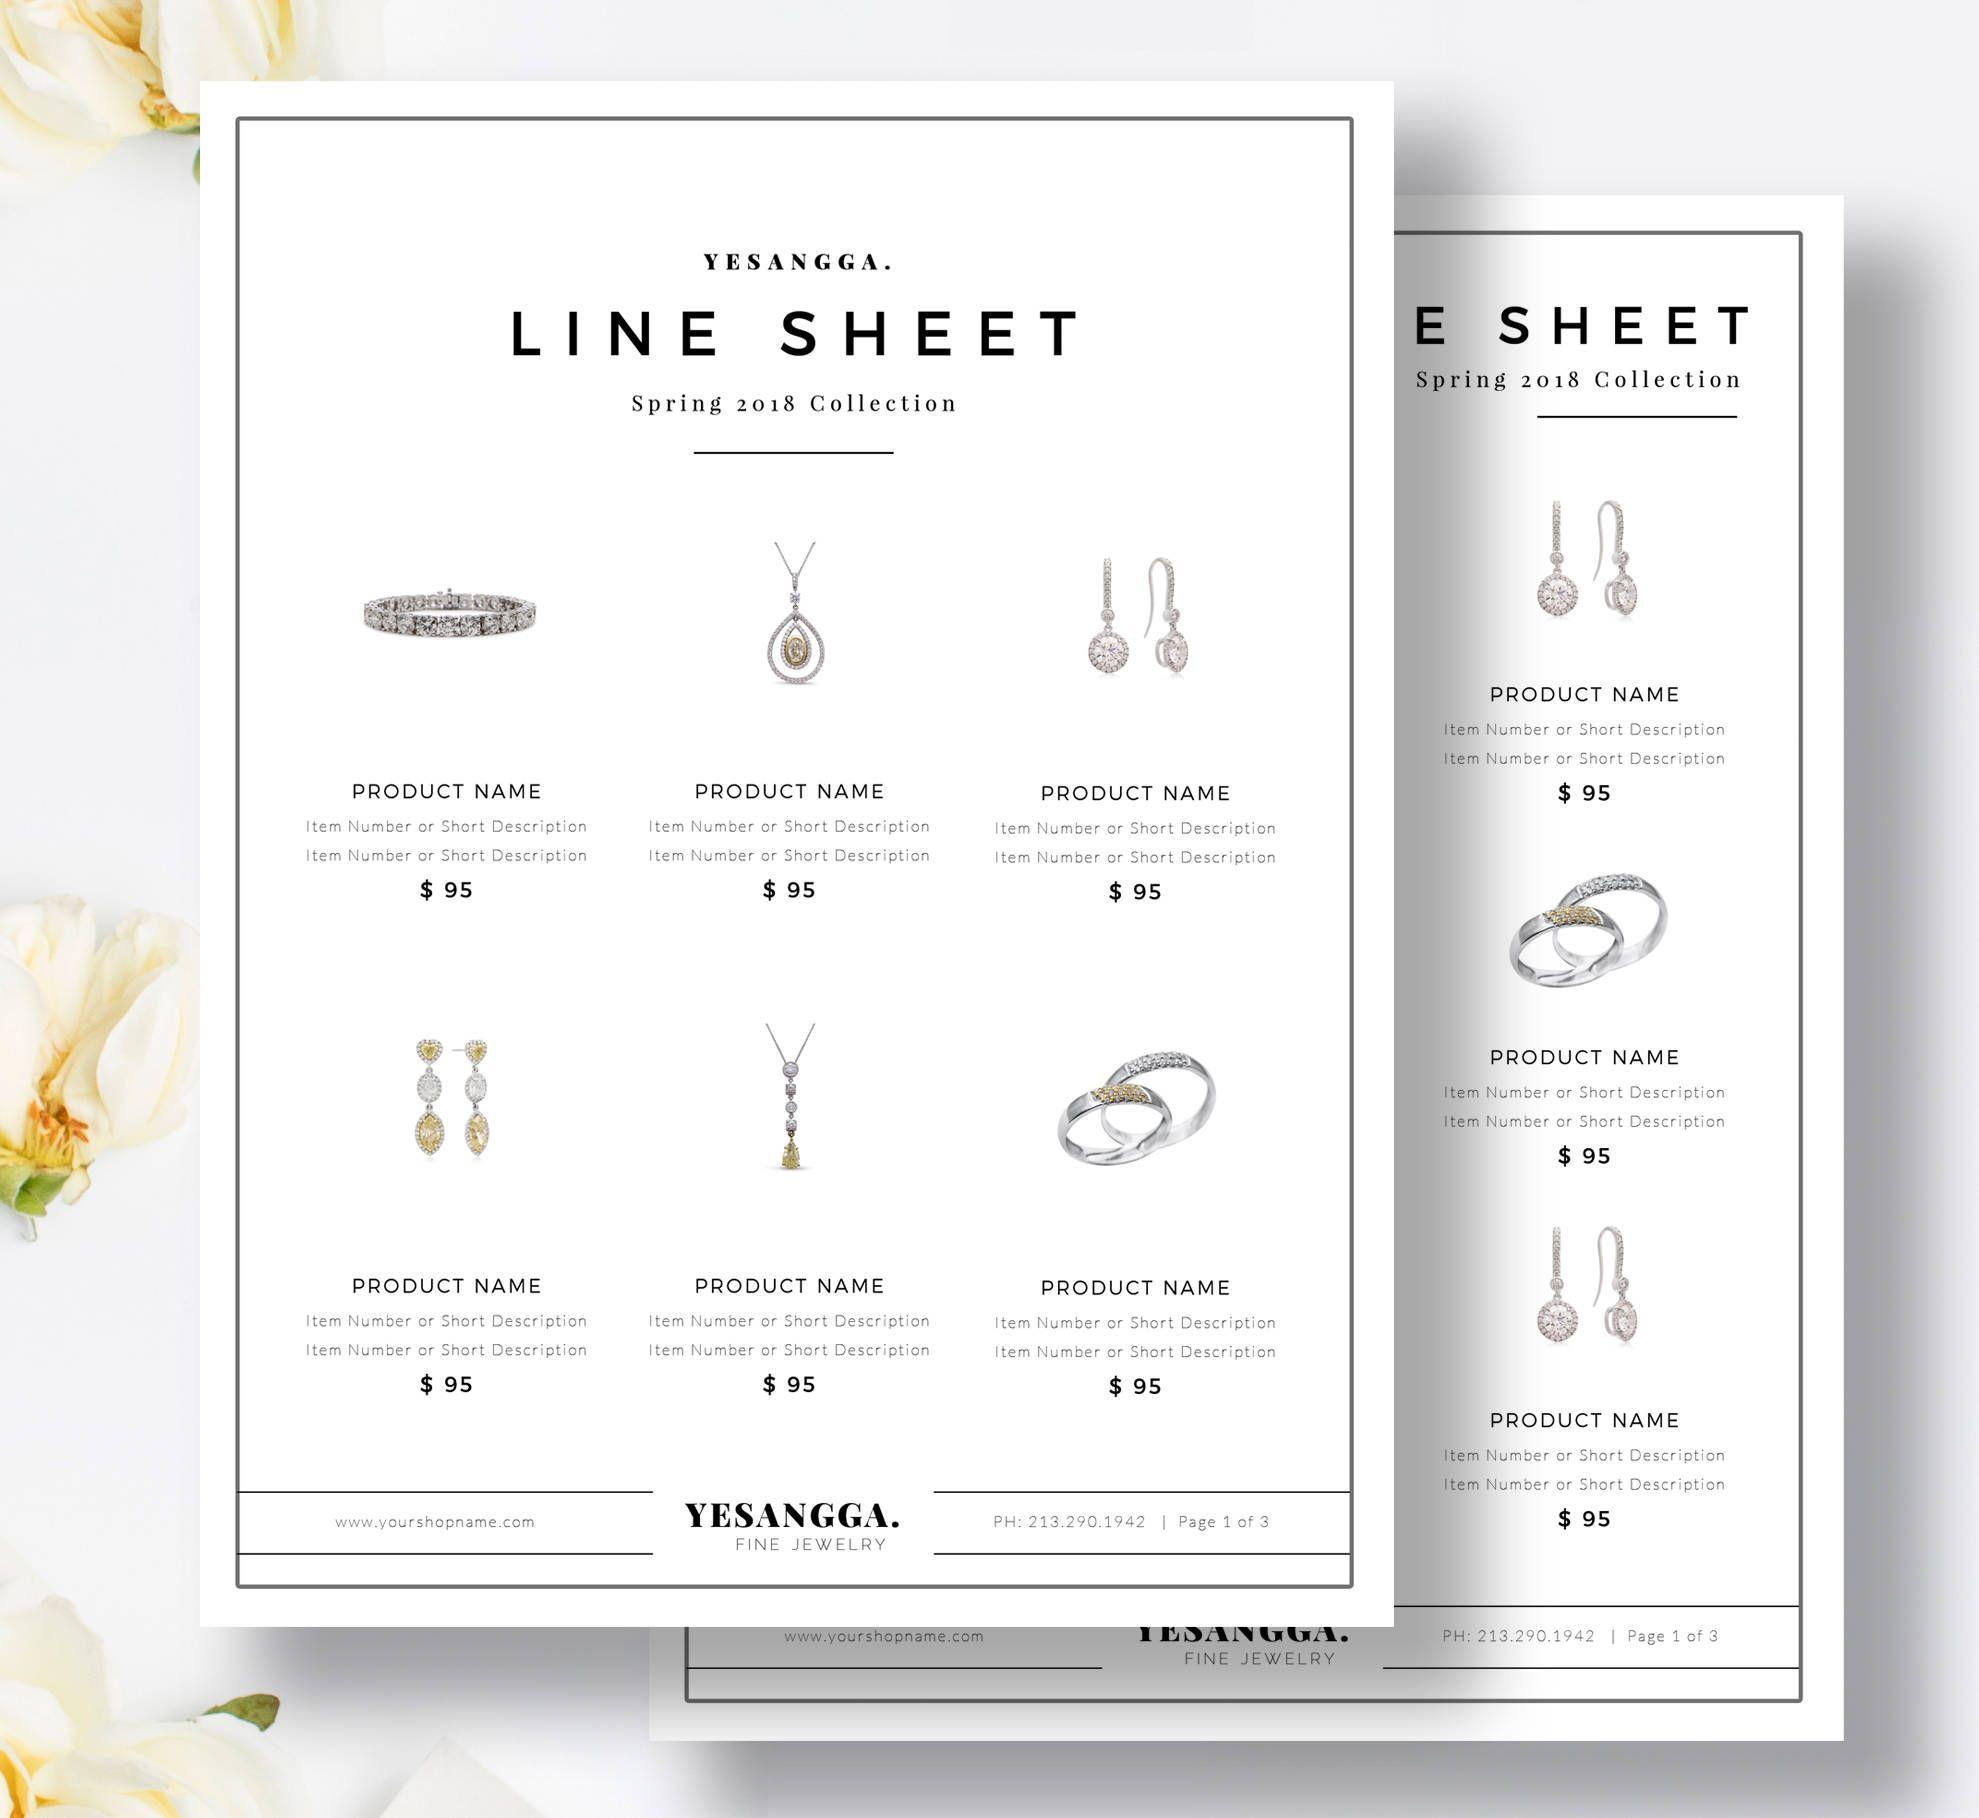 006 Unusual Wholesale Line Sheet Template Sample  ExcelFull